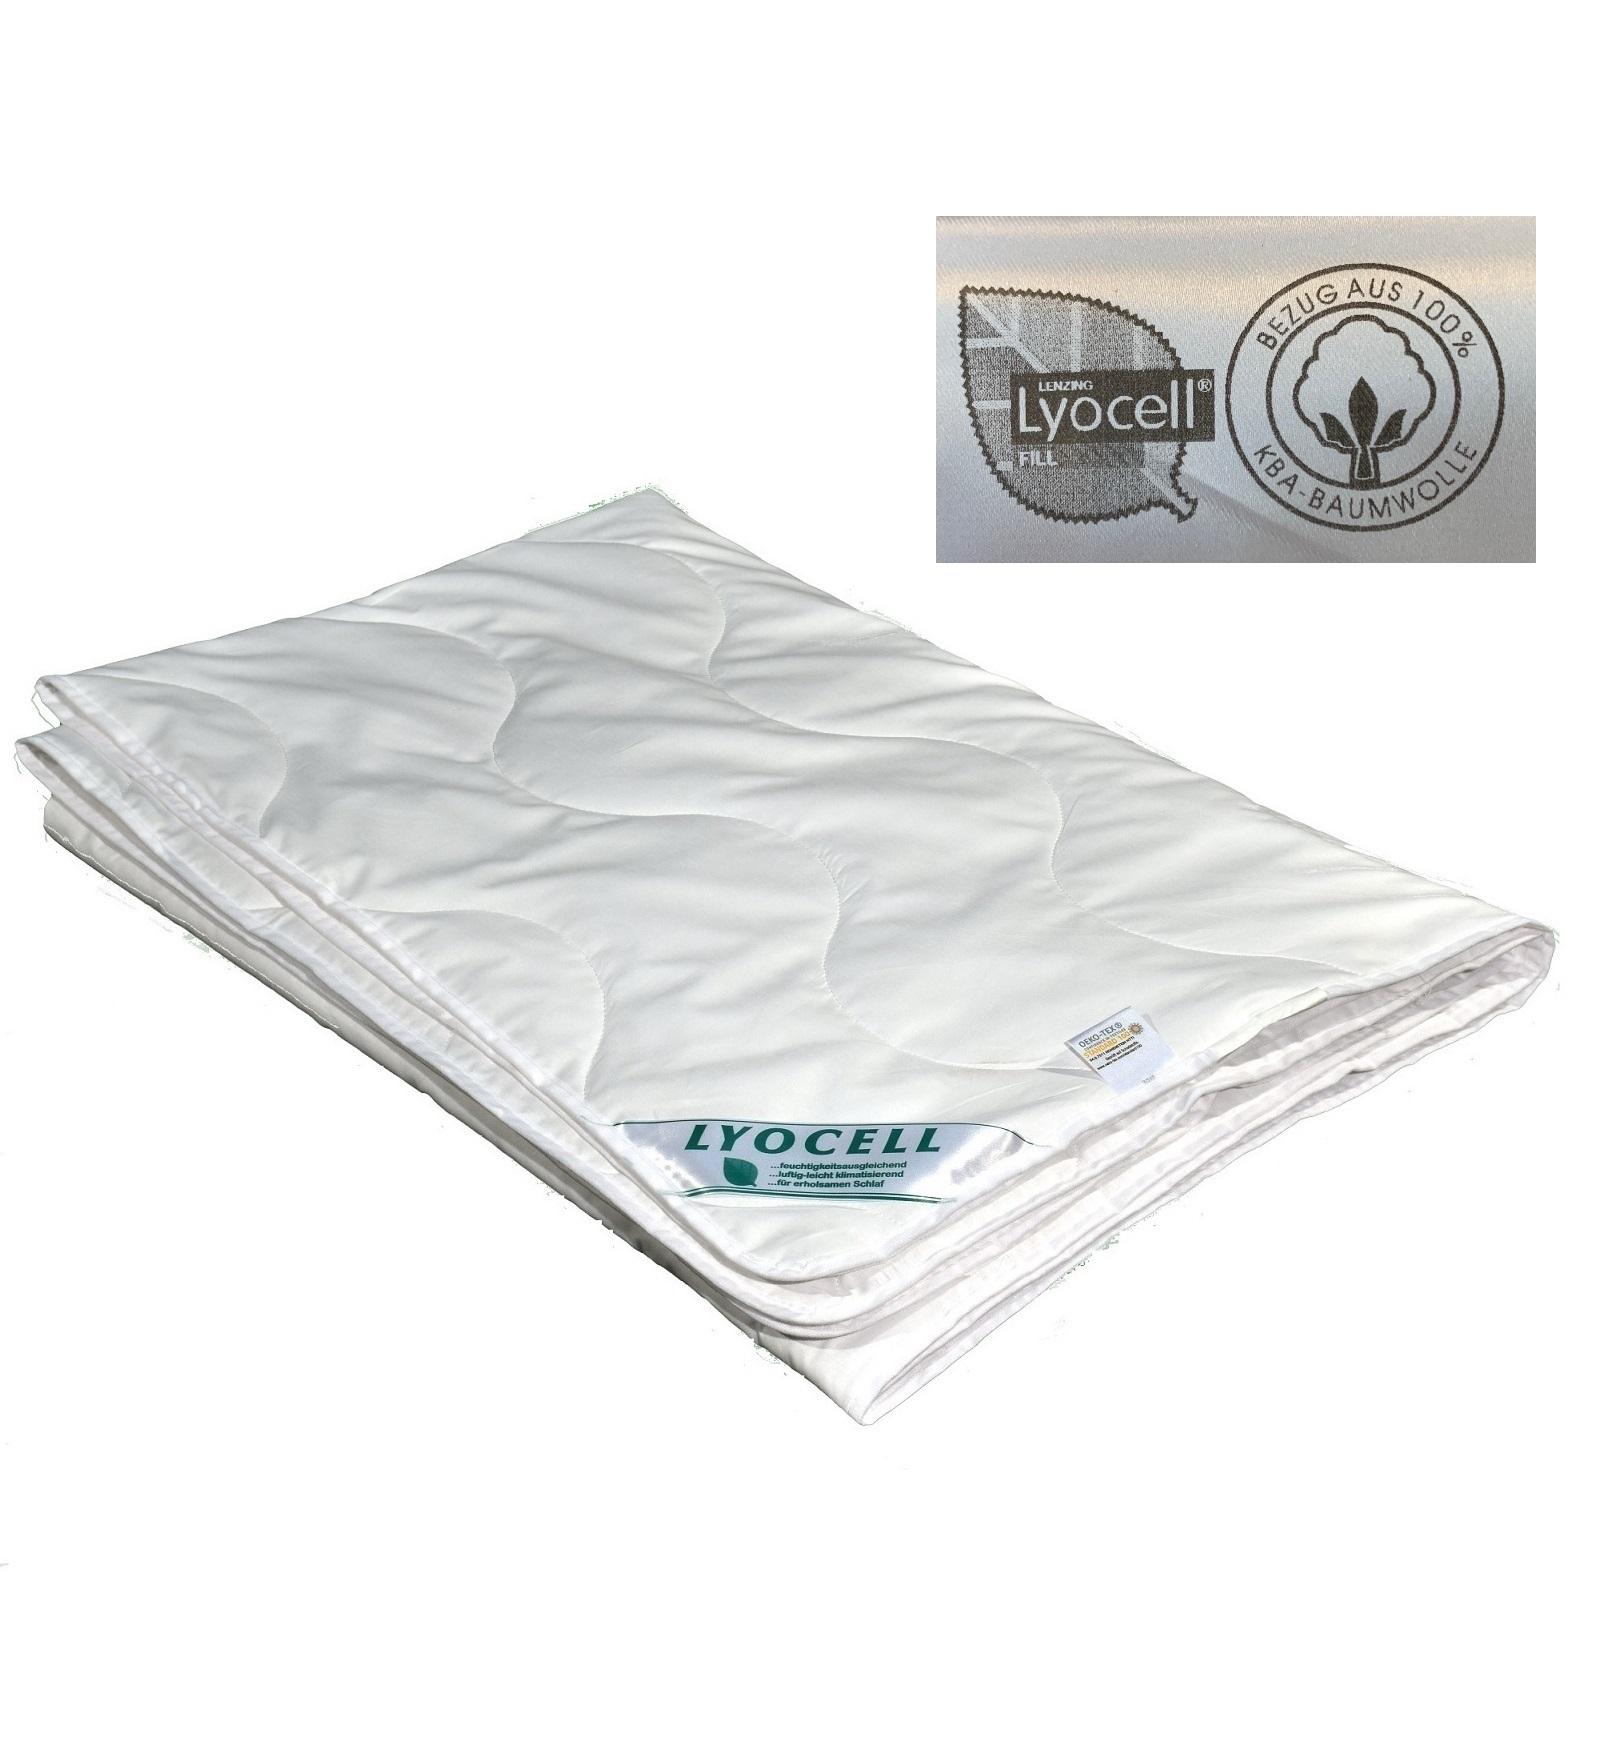 Sommerdecke super leicht Lyocell Tencel kbA kontr. bio Anbau 100% Natur 200x220 cm